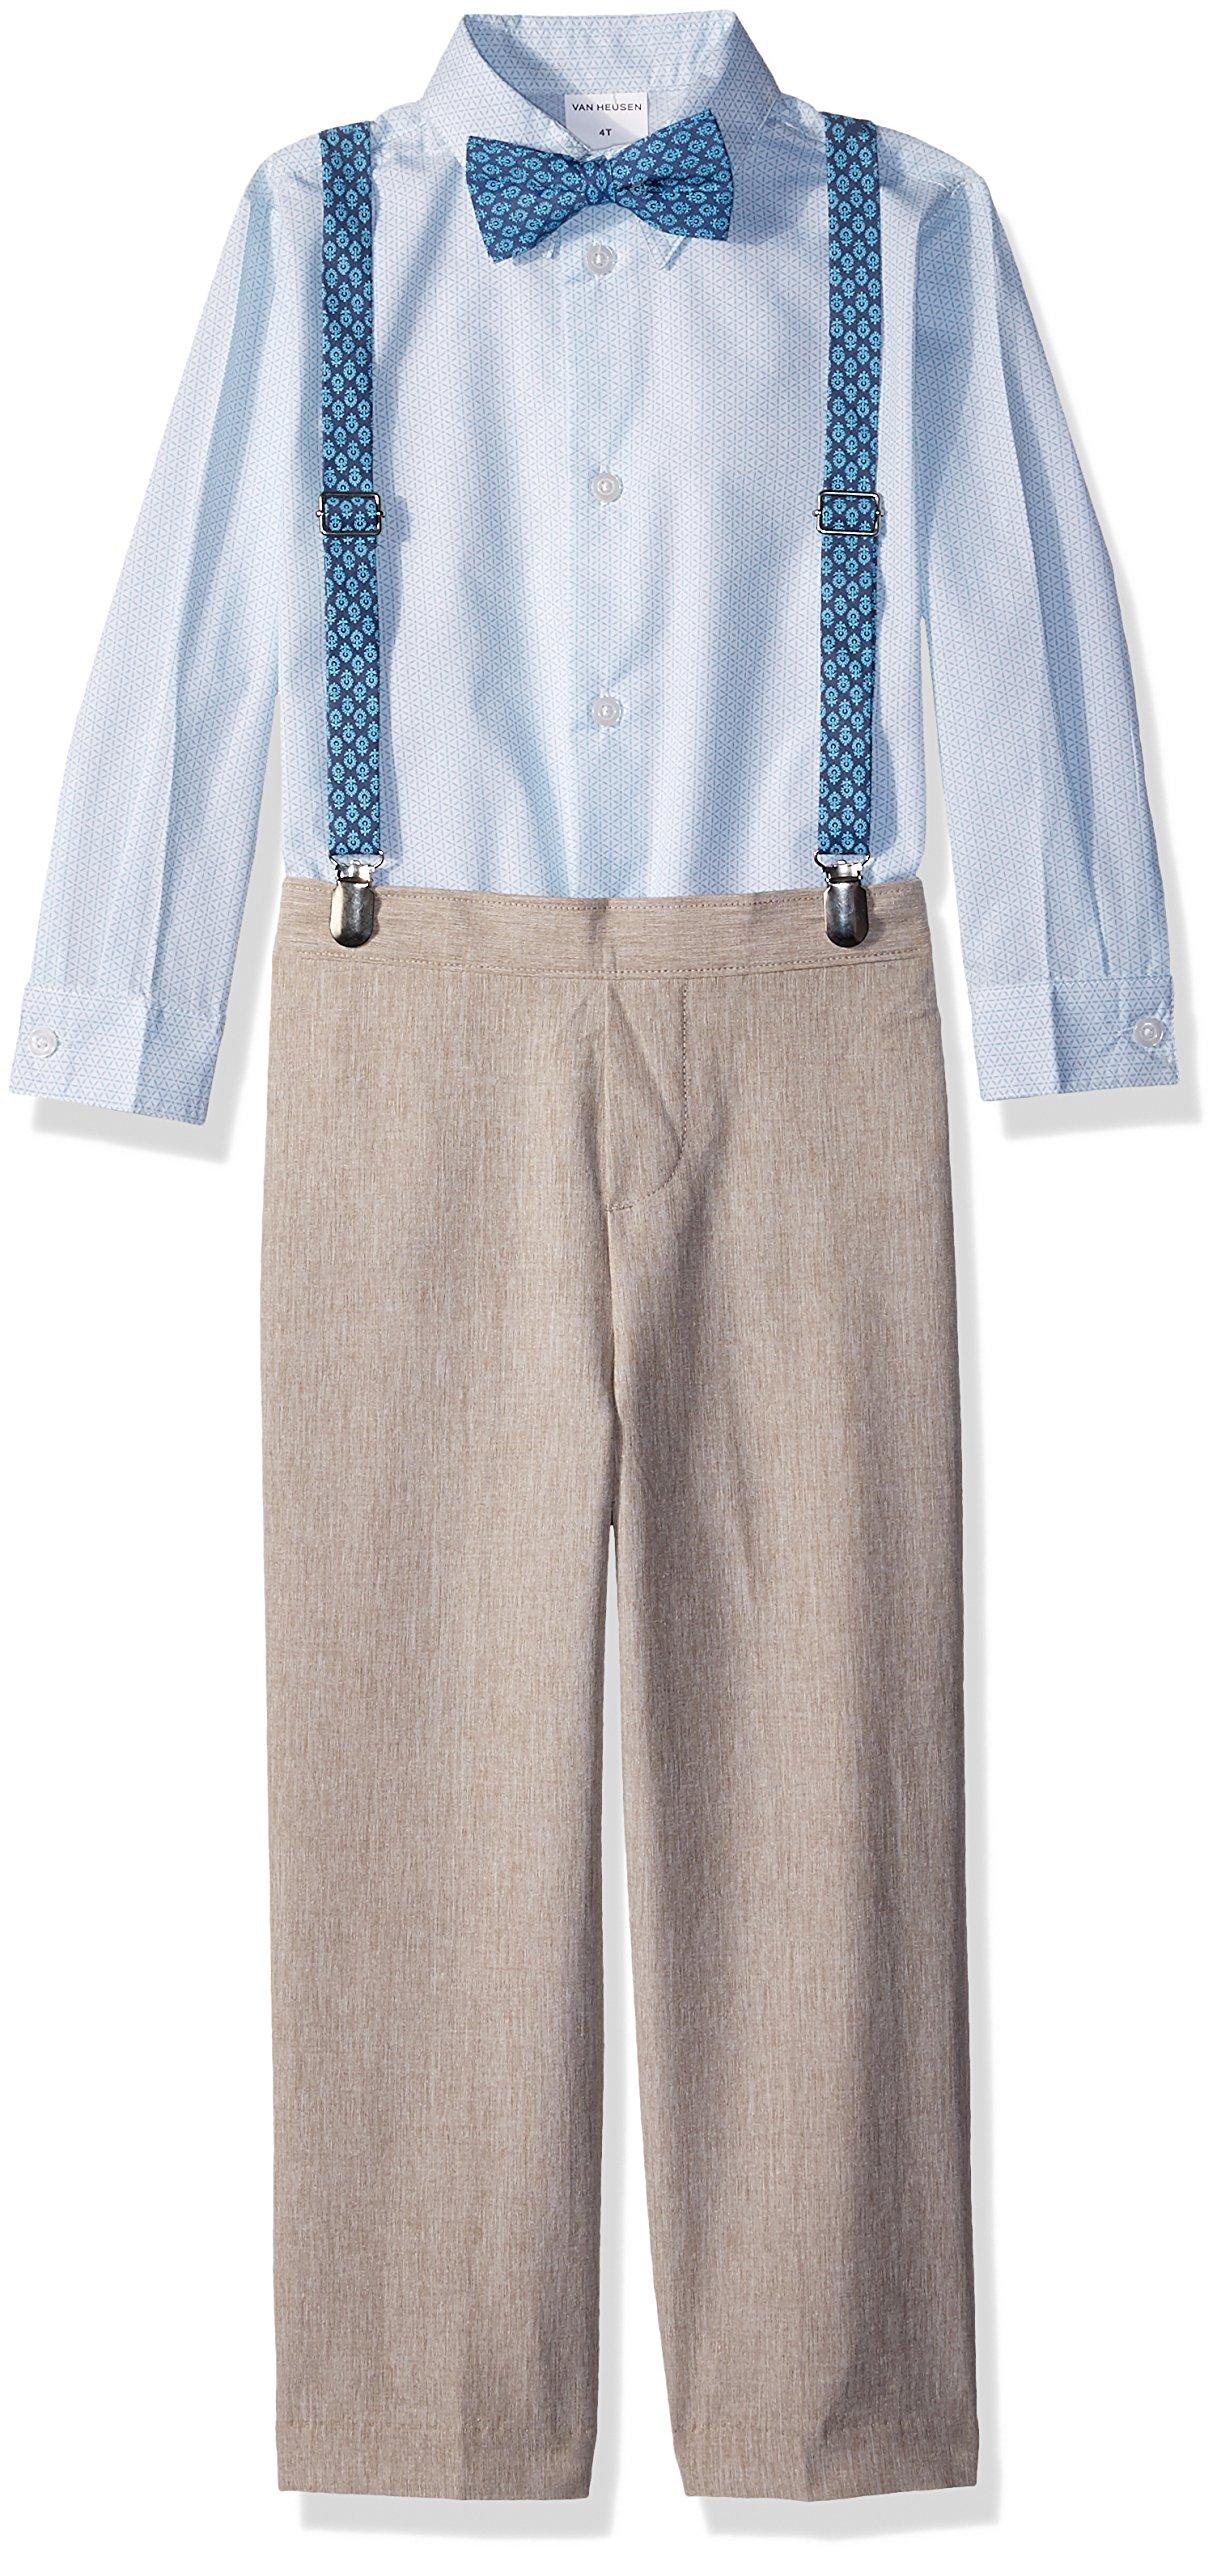 Van Heusen Little Boys' Four Piece Suspender Set, Linen Cornstalk, 5